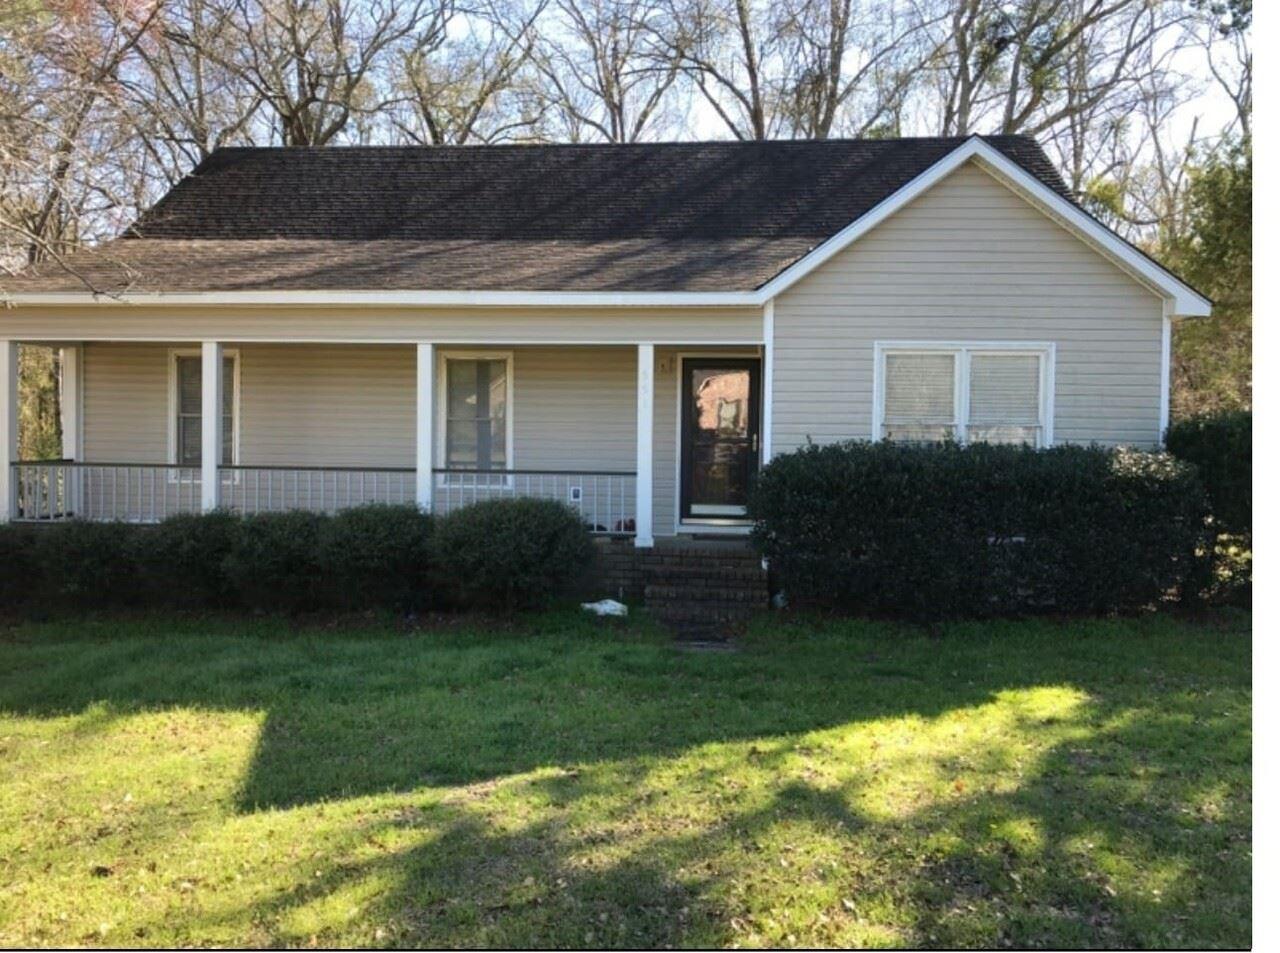 551 Pleasant Point Dr, Statesboro, GA 30458 - #: 8960744